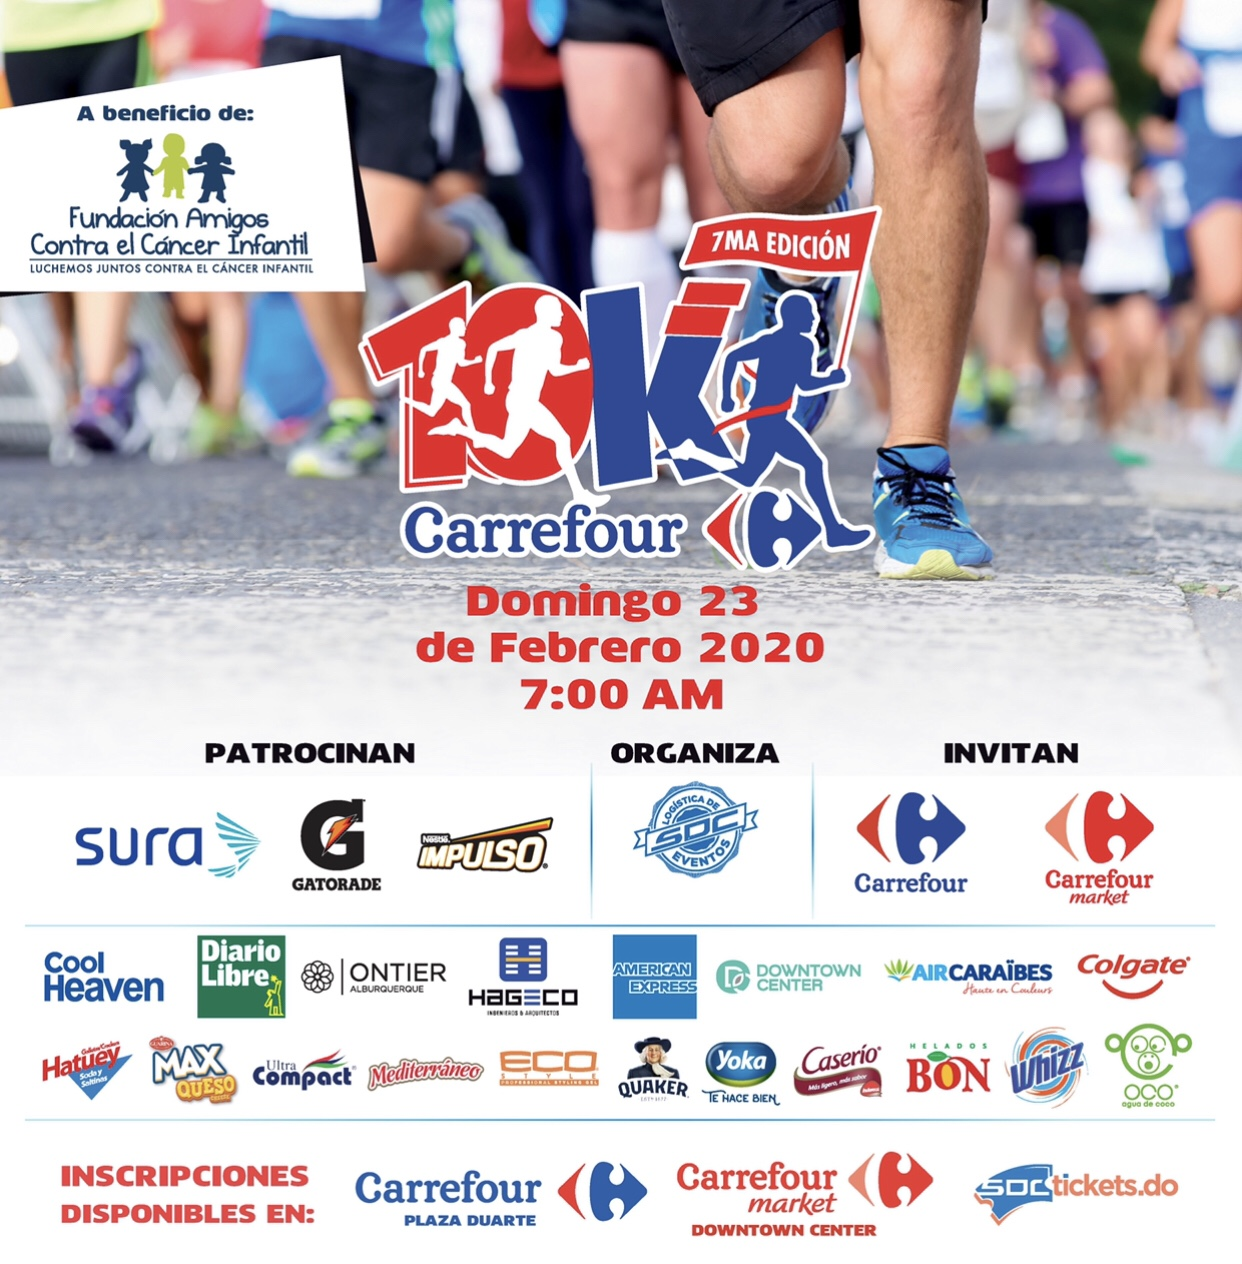 Carrefour anuncia 7ma edición de la carrera 10K Carrefour